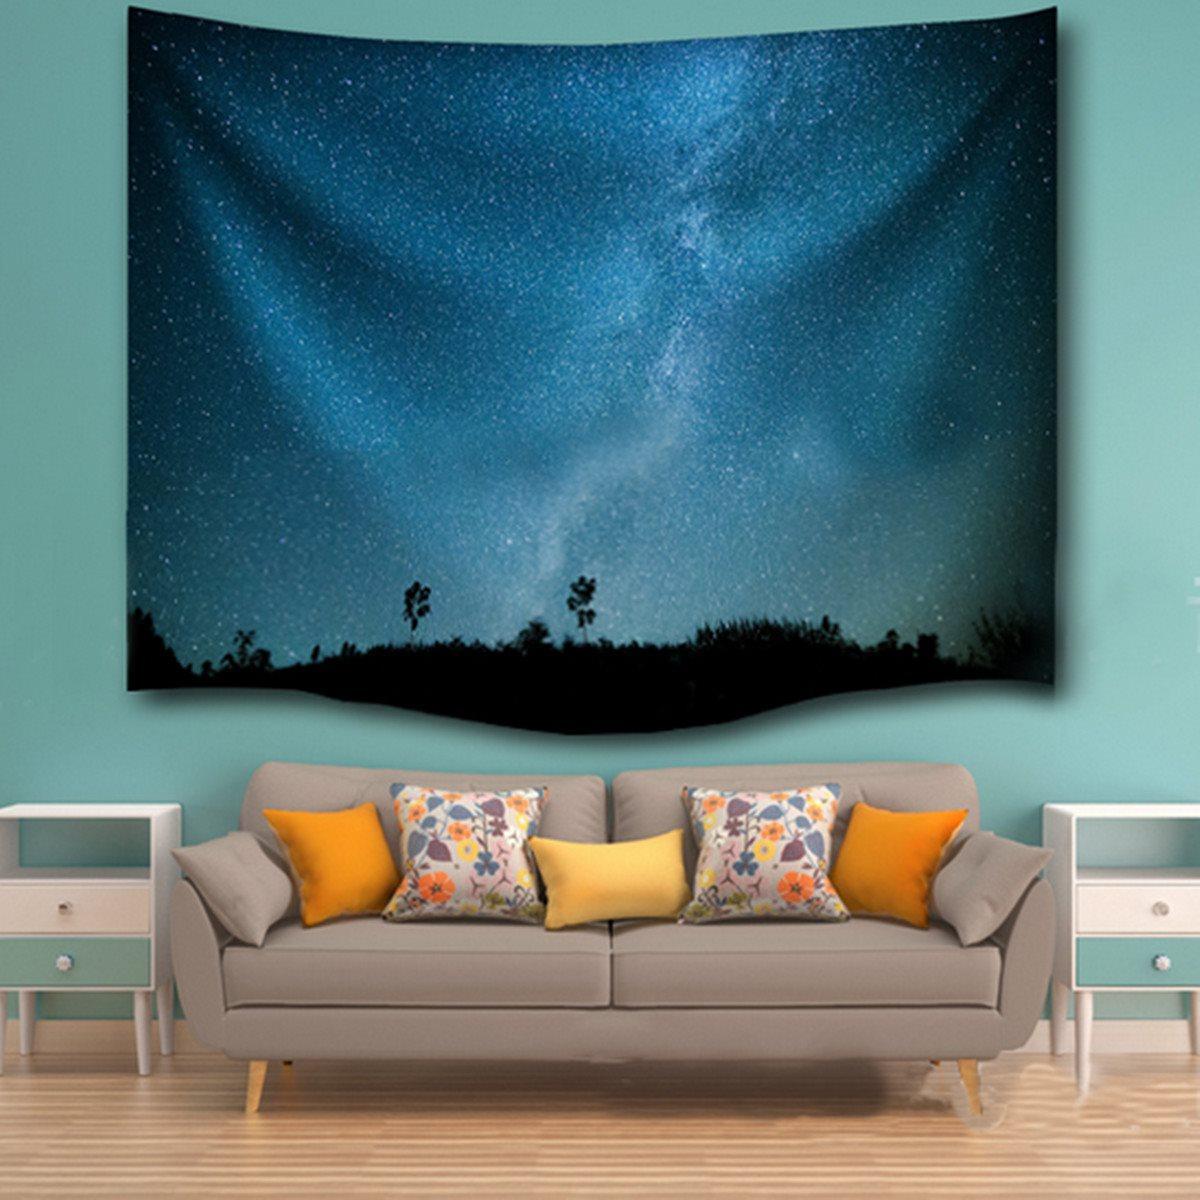 Wall Hanging Indian Mandala Star Tapestry 153x102cm Throw Blanket